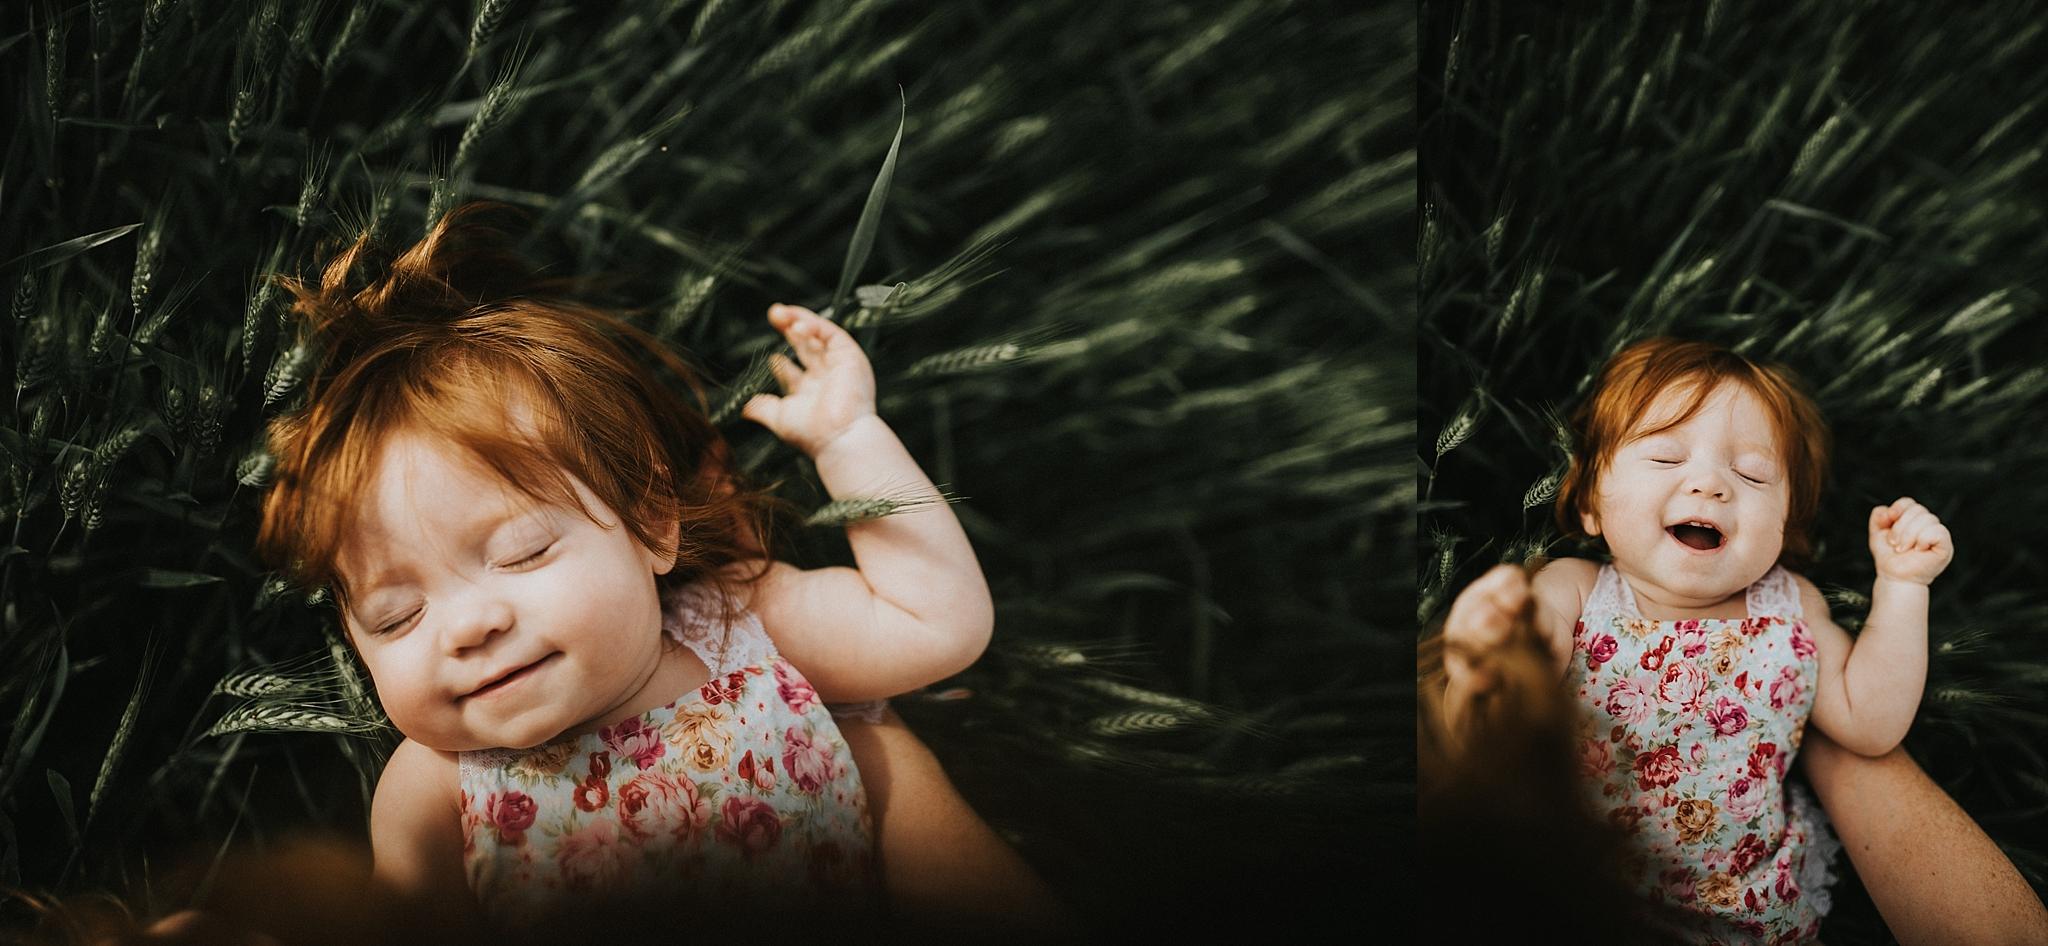 twyla jones photography - mother daughter - field and forest-4606_treasure coast florida.jpg